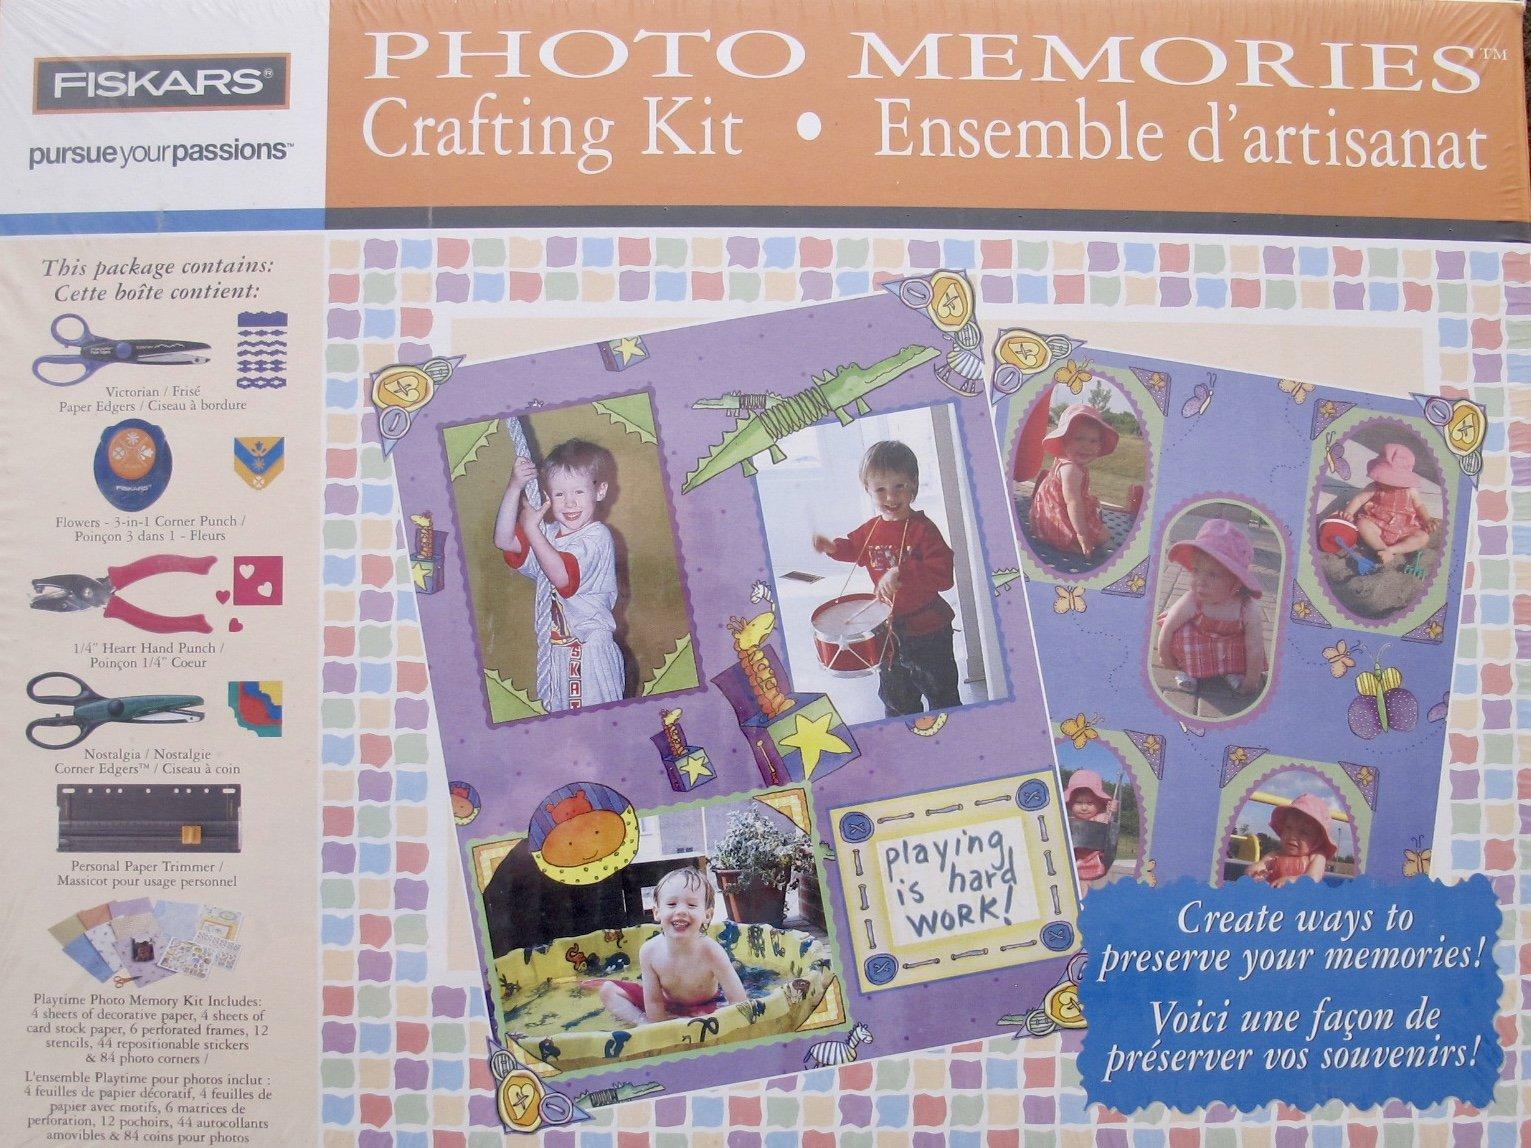 FISKARS Craft PHOTO MEMORIES CRAFTING KIT w Decorative EDGERS, 3-in-1 Corner PUNCH, FLOWER Hand PUNCH, 12 STENCILS & More!